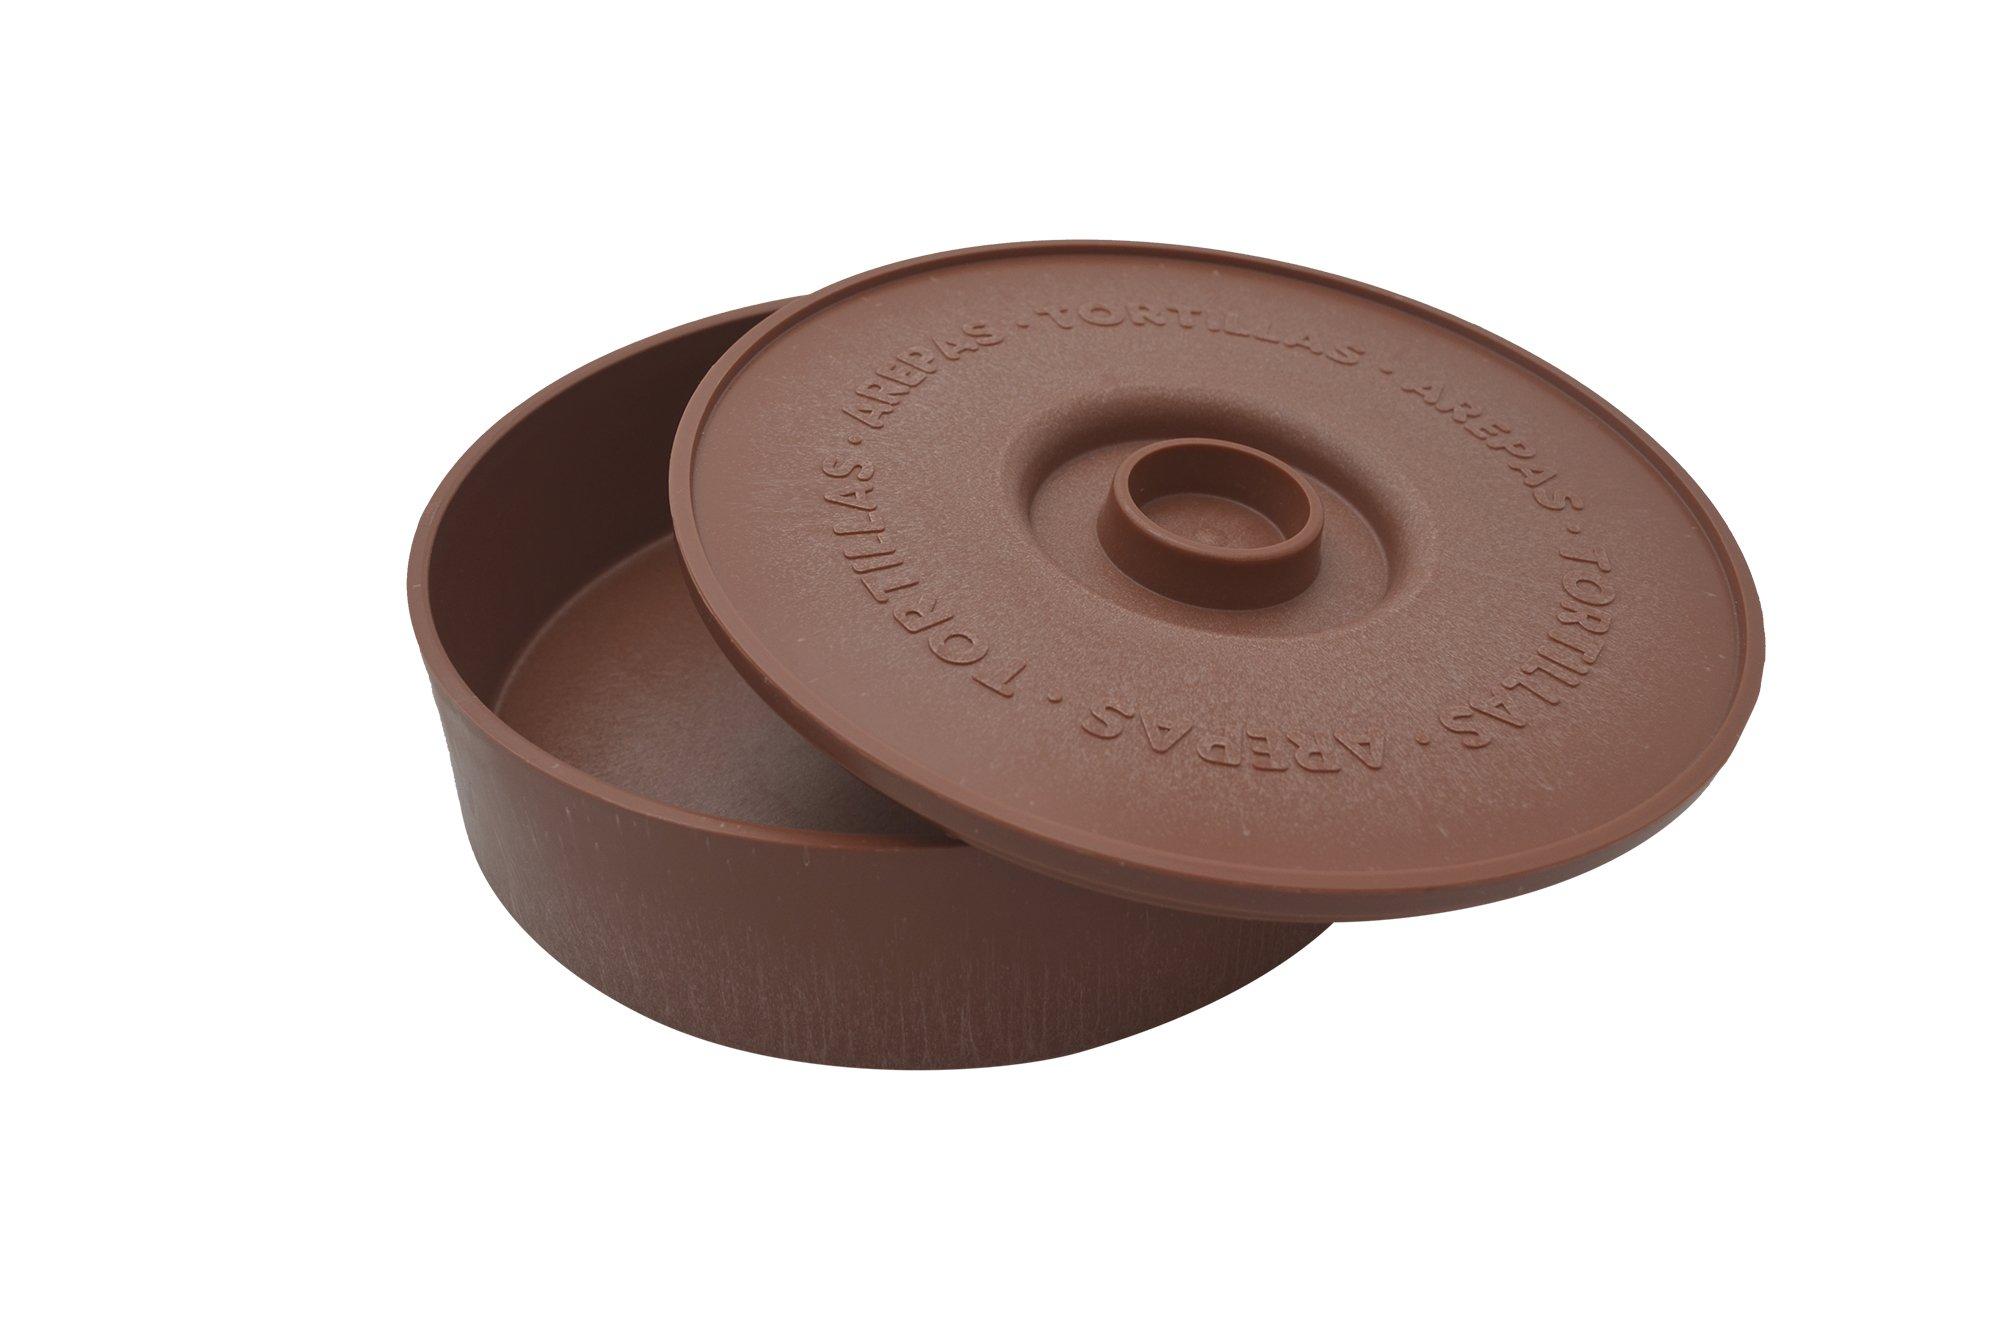 IMUSA USA MEXI-1000-TORTW Tortilla Warmer Terracota 8.5-Inch, Brown Brick Color